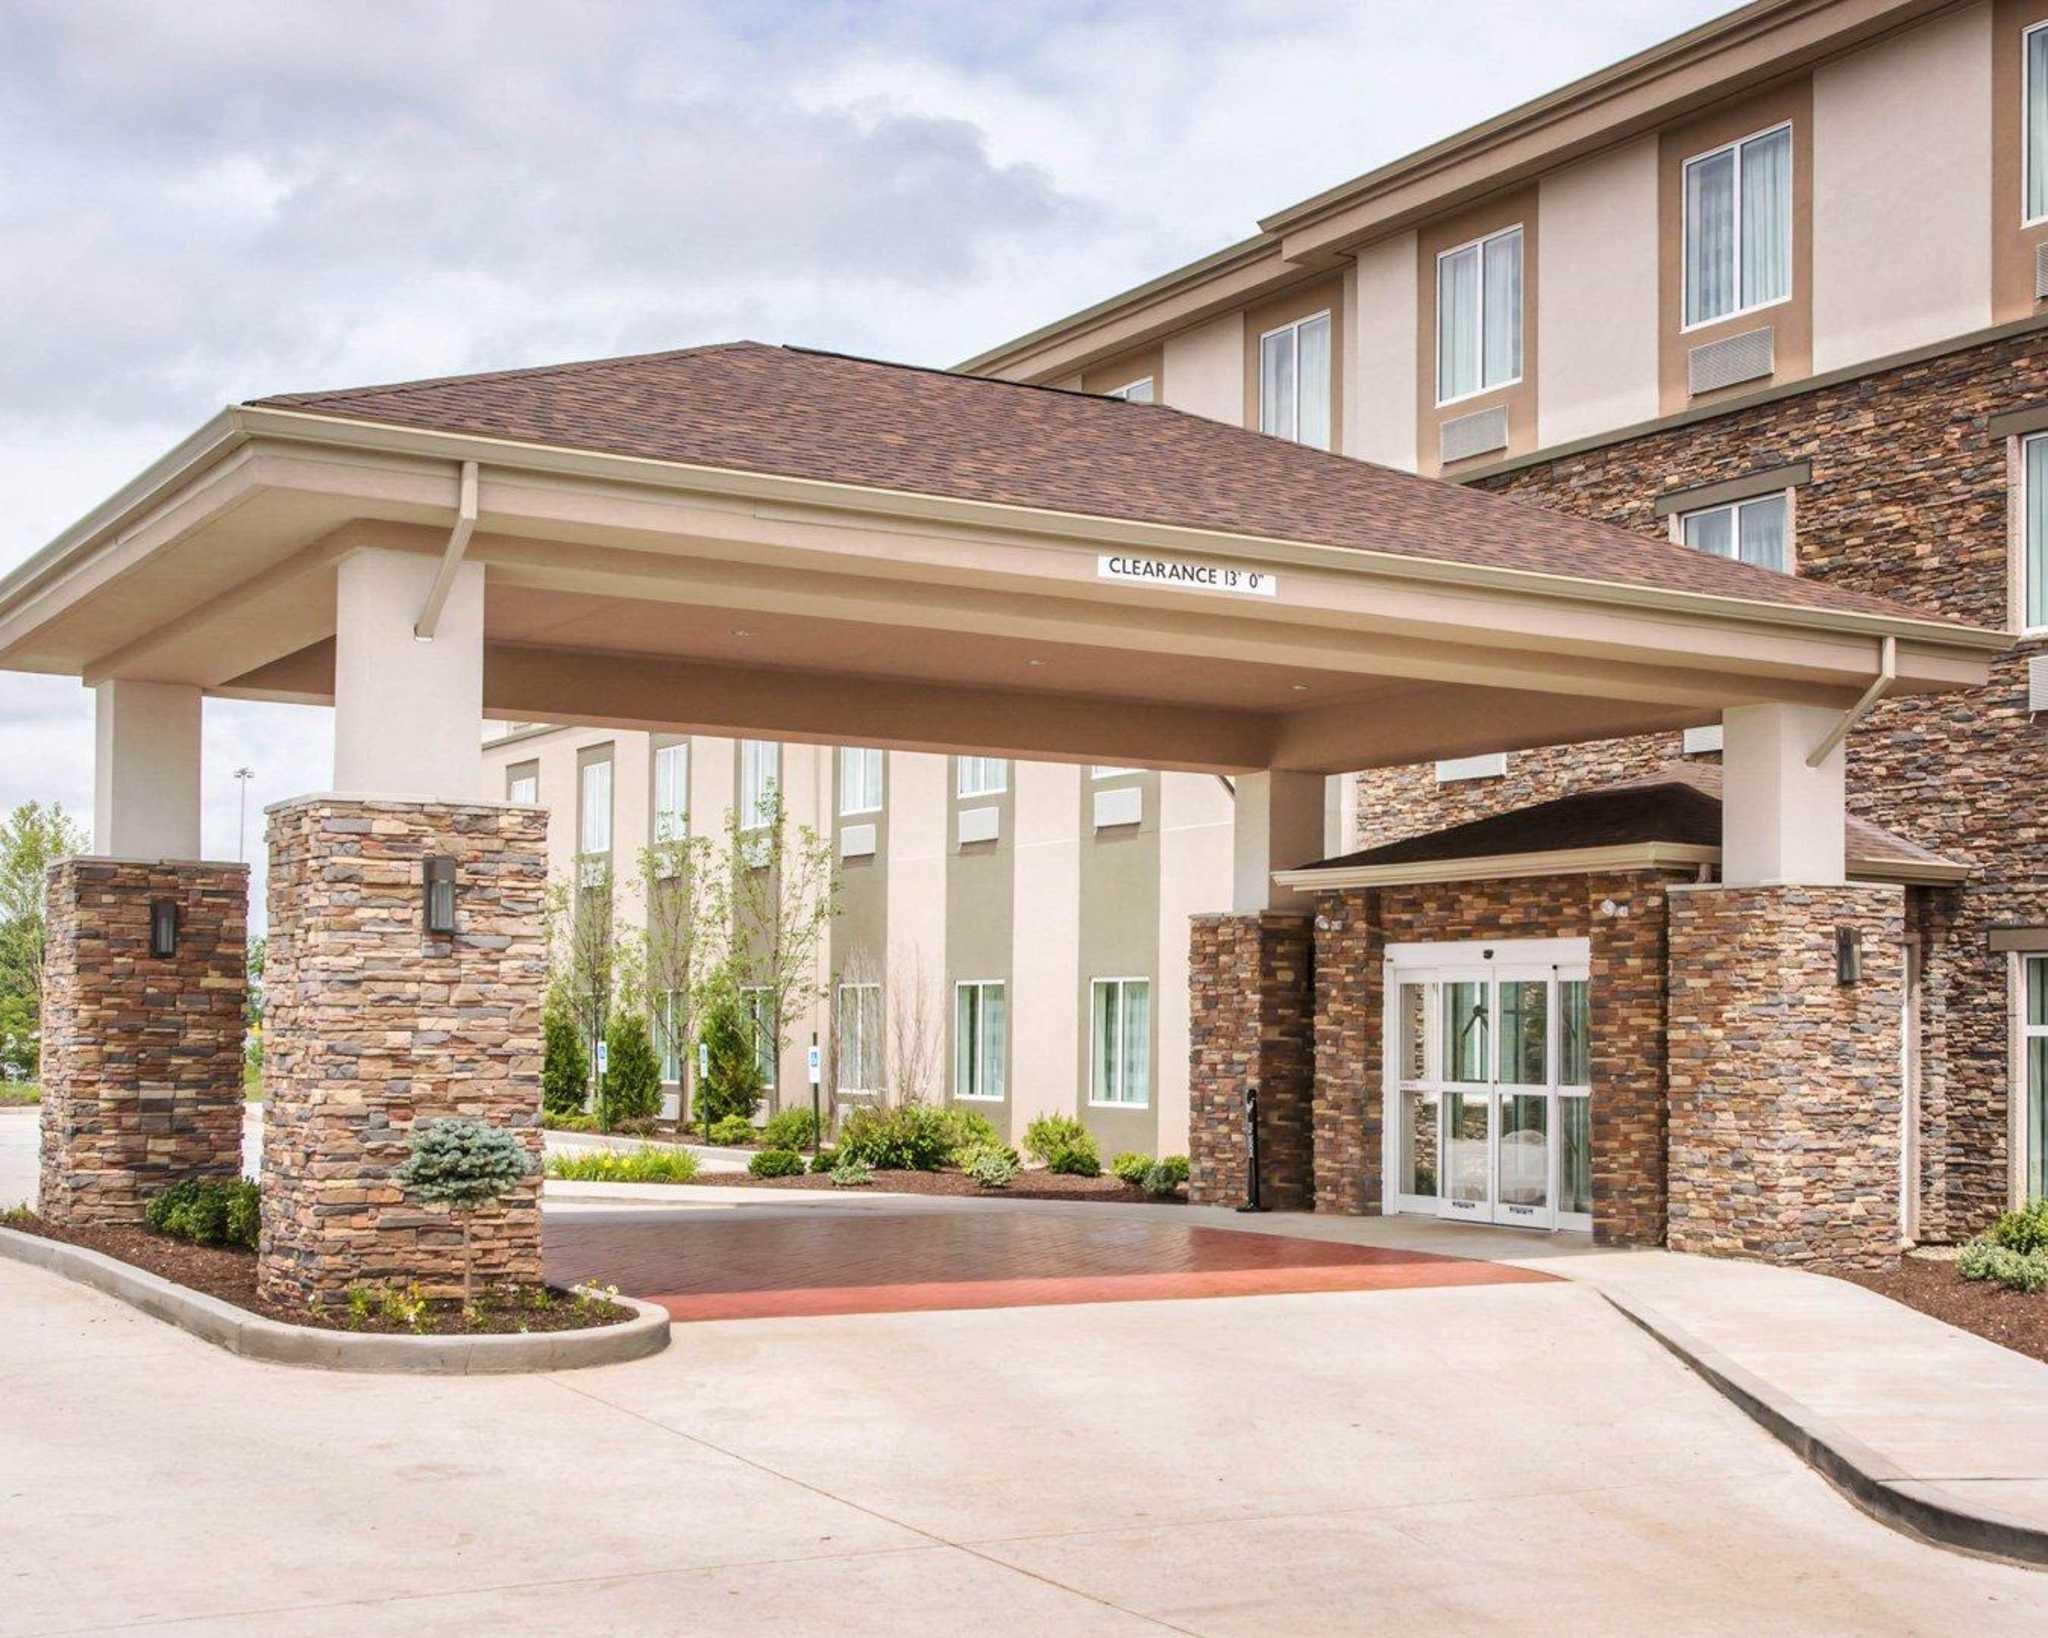 Sleep Inn & Suites Parkersburg-Marietta image 7